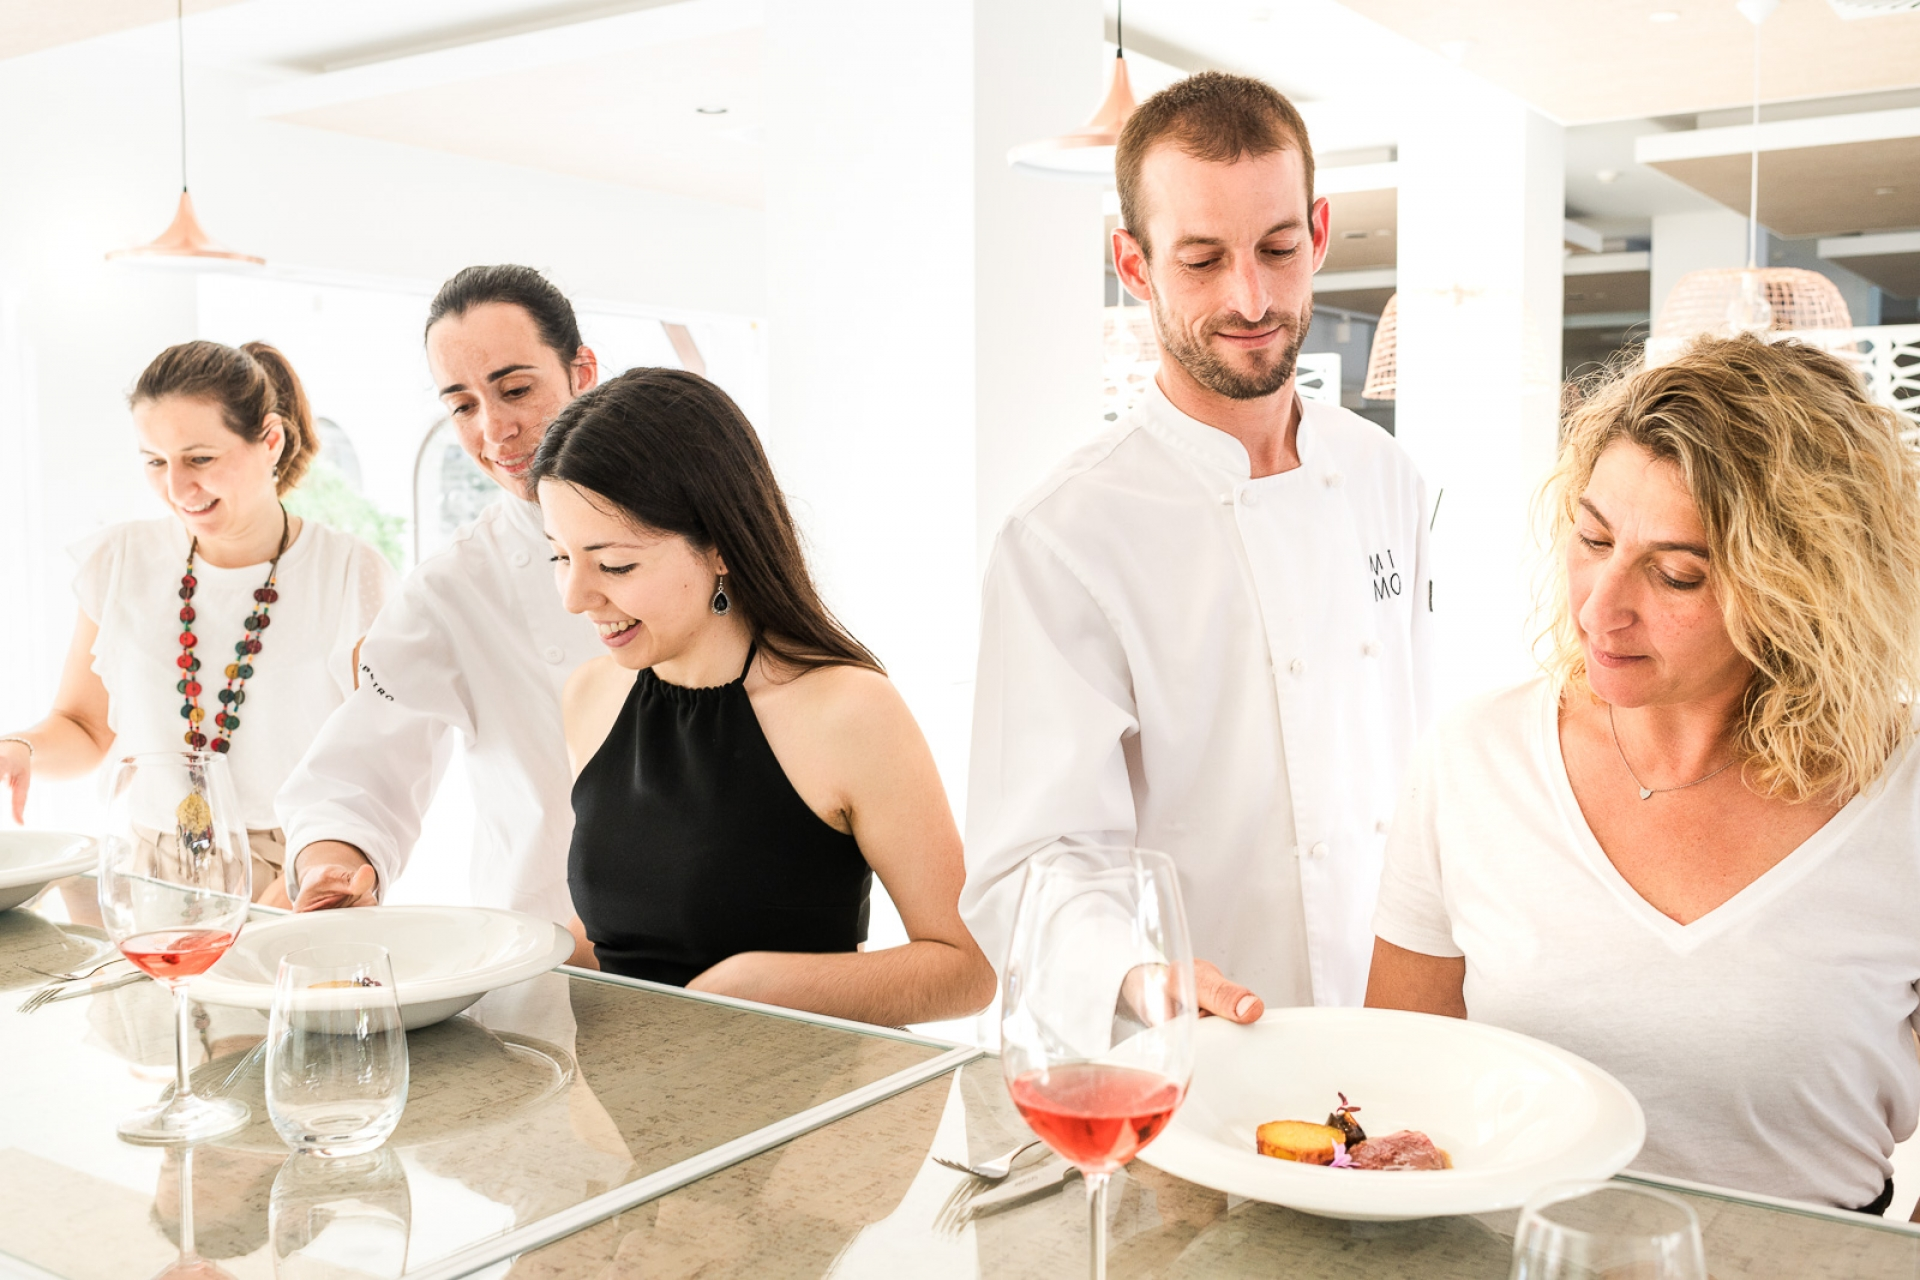 AlgarveCool_Blog_Chef & Somm: O Jantar Vínico no Pine Cliffs Resort